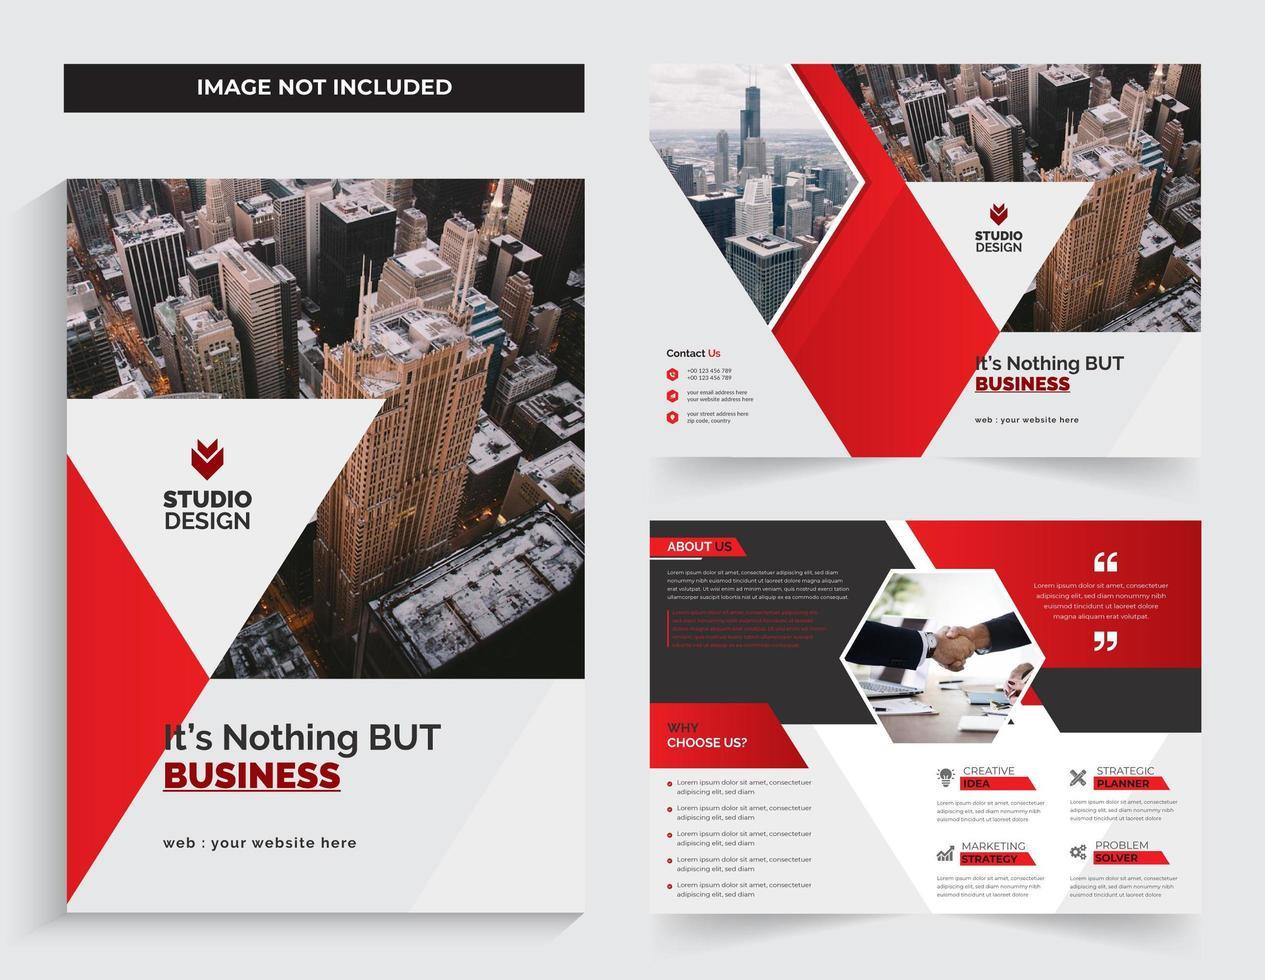 Business Corporate Bi-fold  Template Design Red Color vector